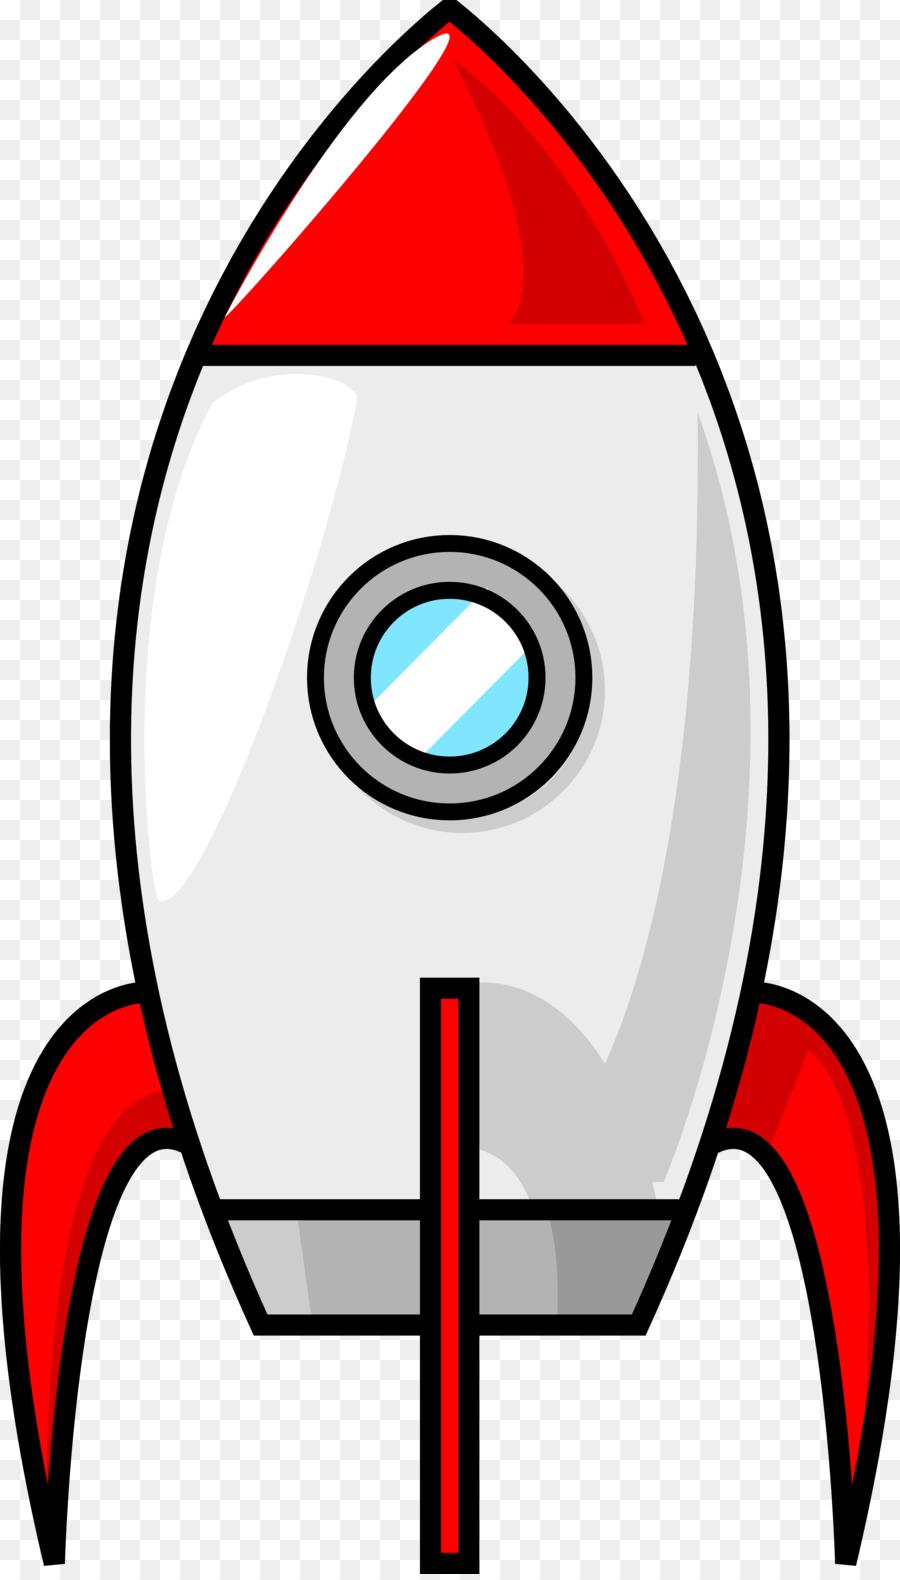 Clipart rocket spaceship. Ship cartoon spacecraft transparent